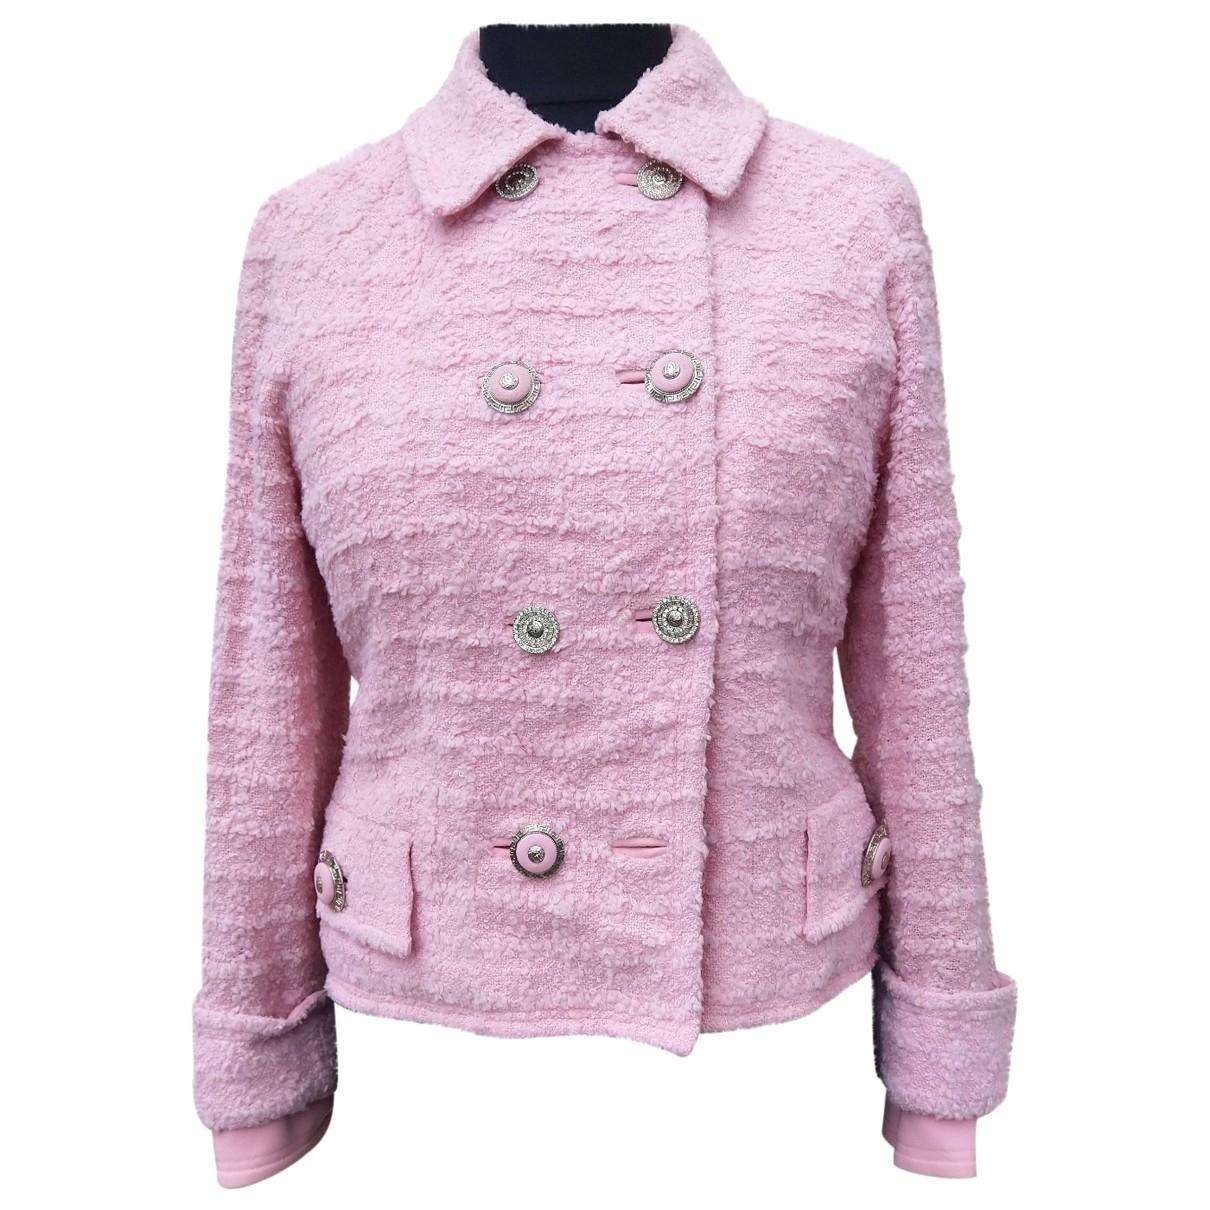 Gianni Versace \N Pink Wool jacket for Women 42 IT